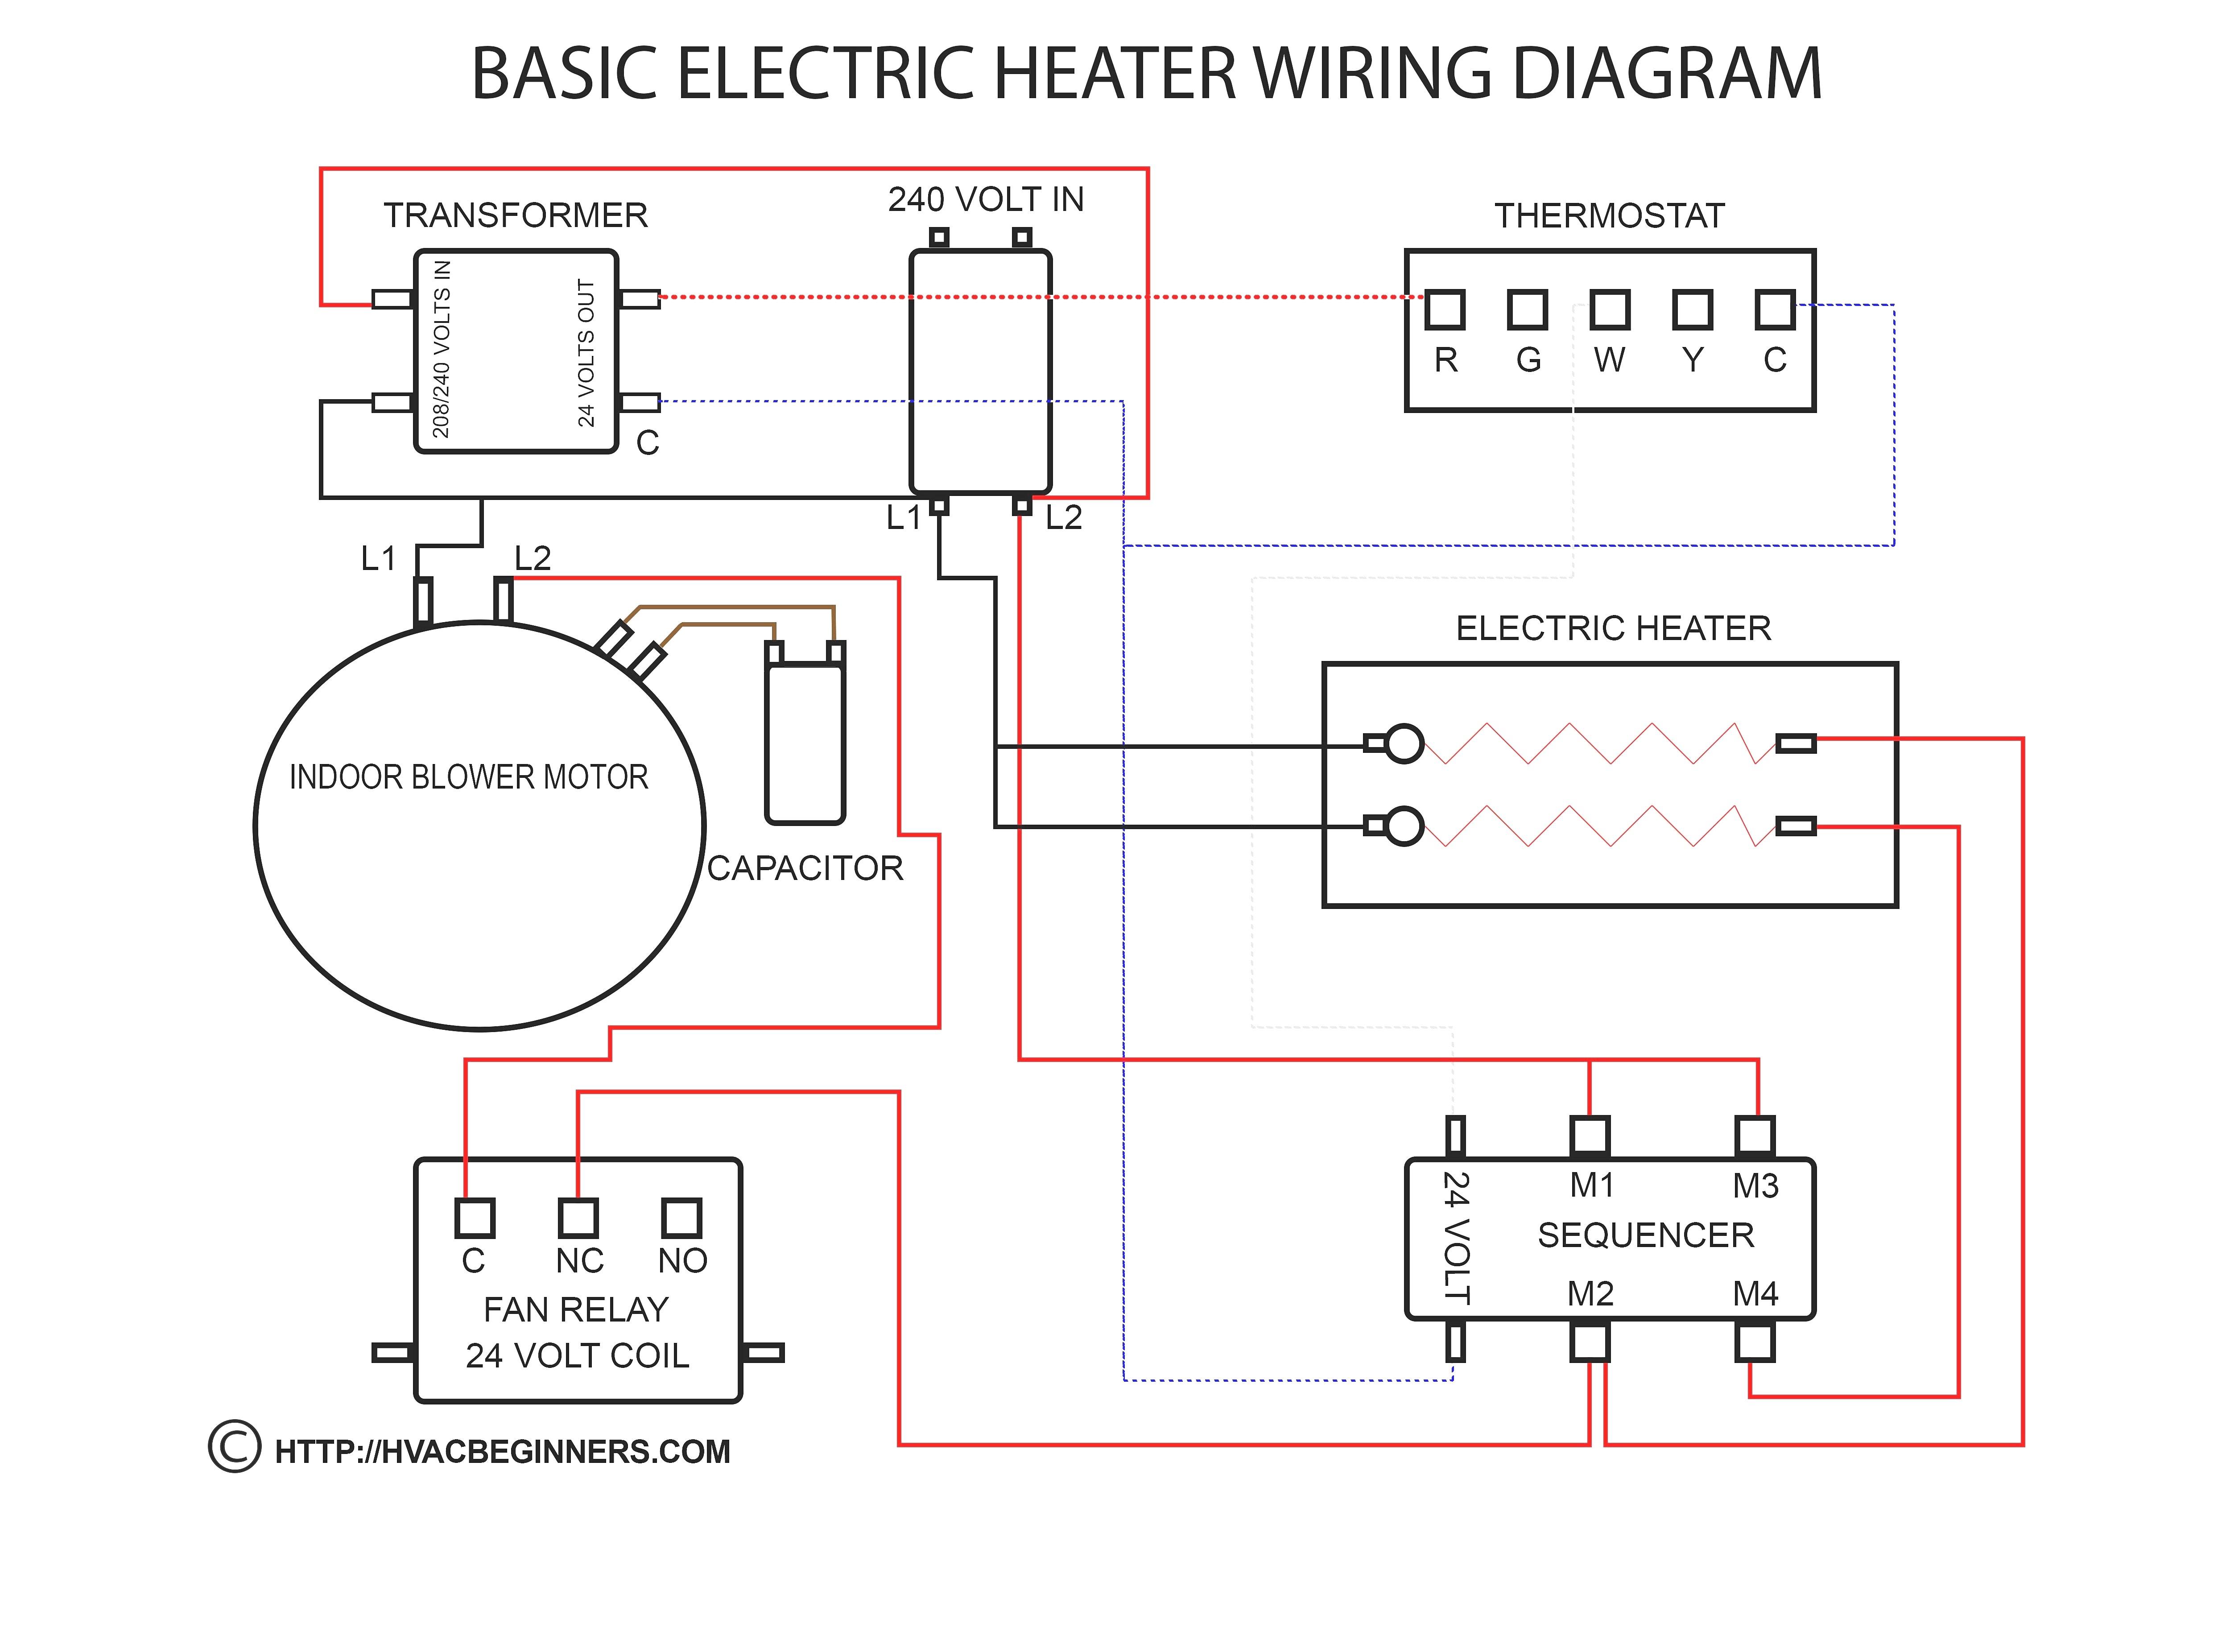 Tappan Air Conditioner Wiring Diagram Free Download Wiring Diagram